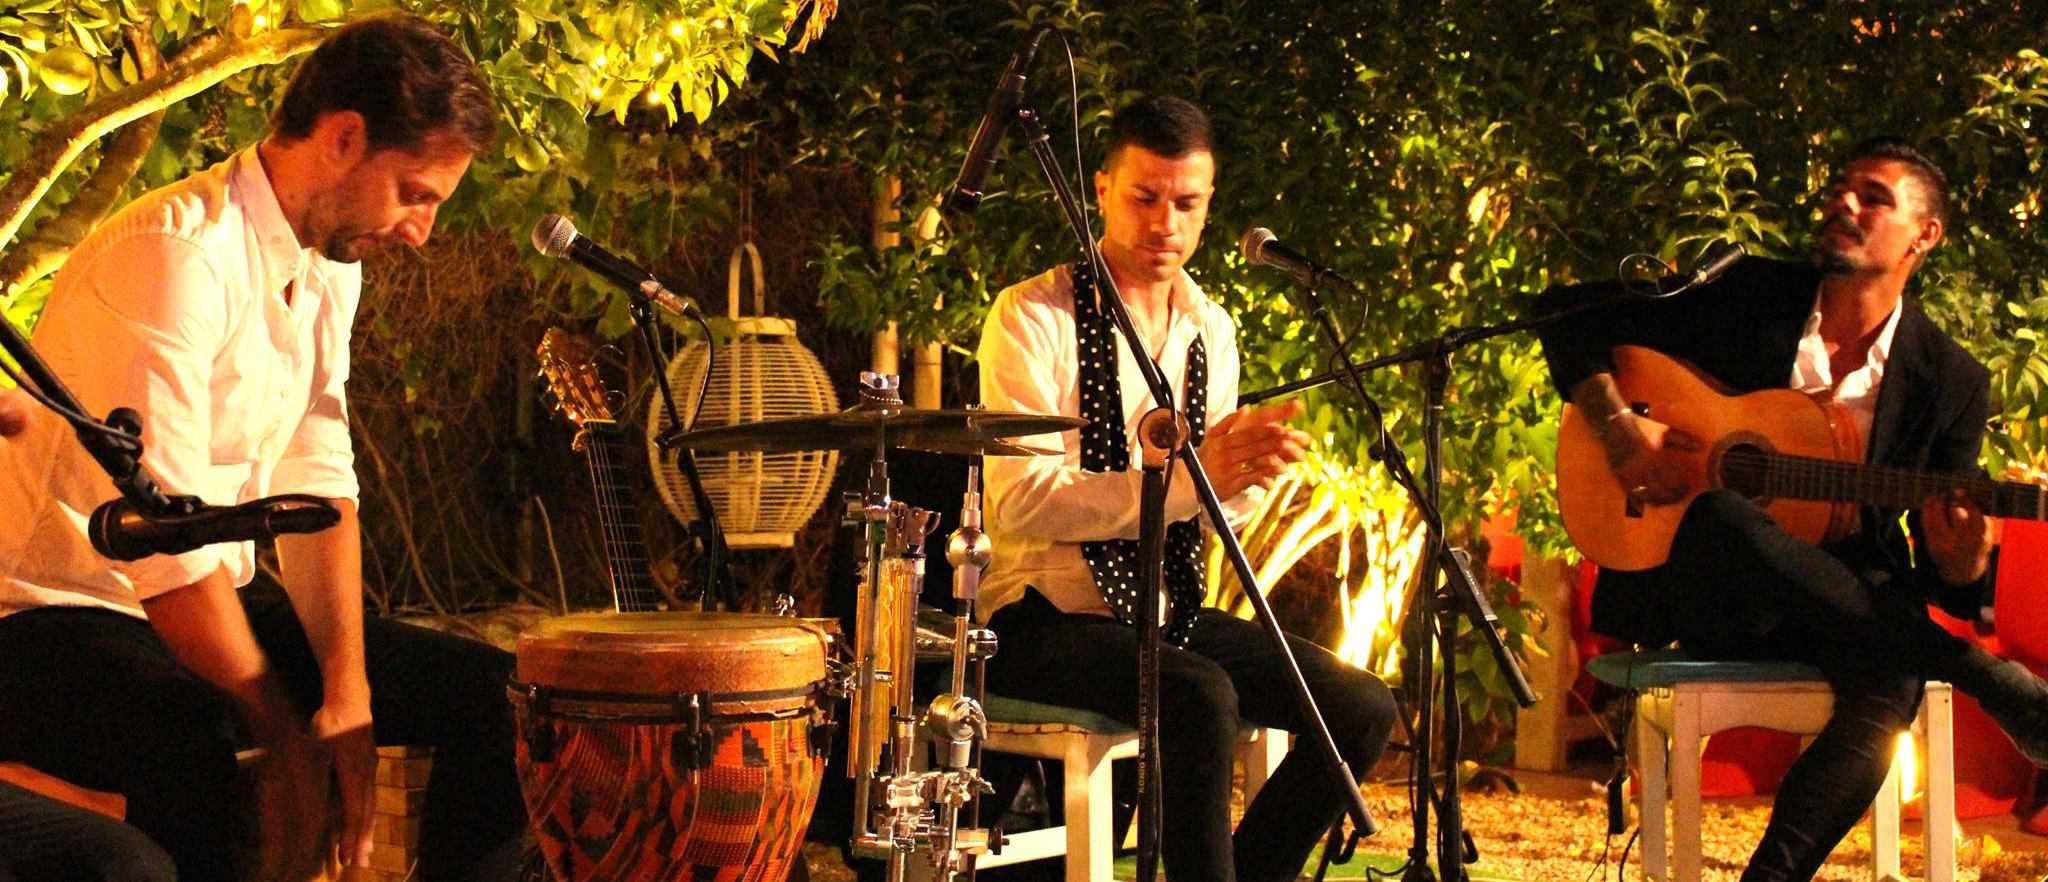 Des nuits de flamenco à Es Caliu avec Flamenco Querencia Ibiza